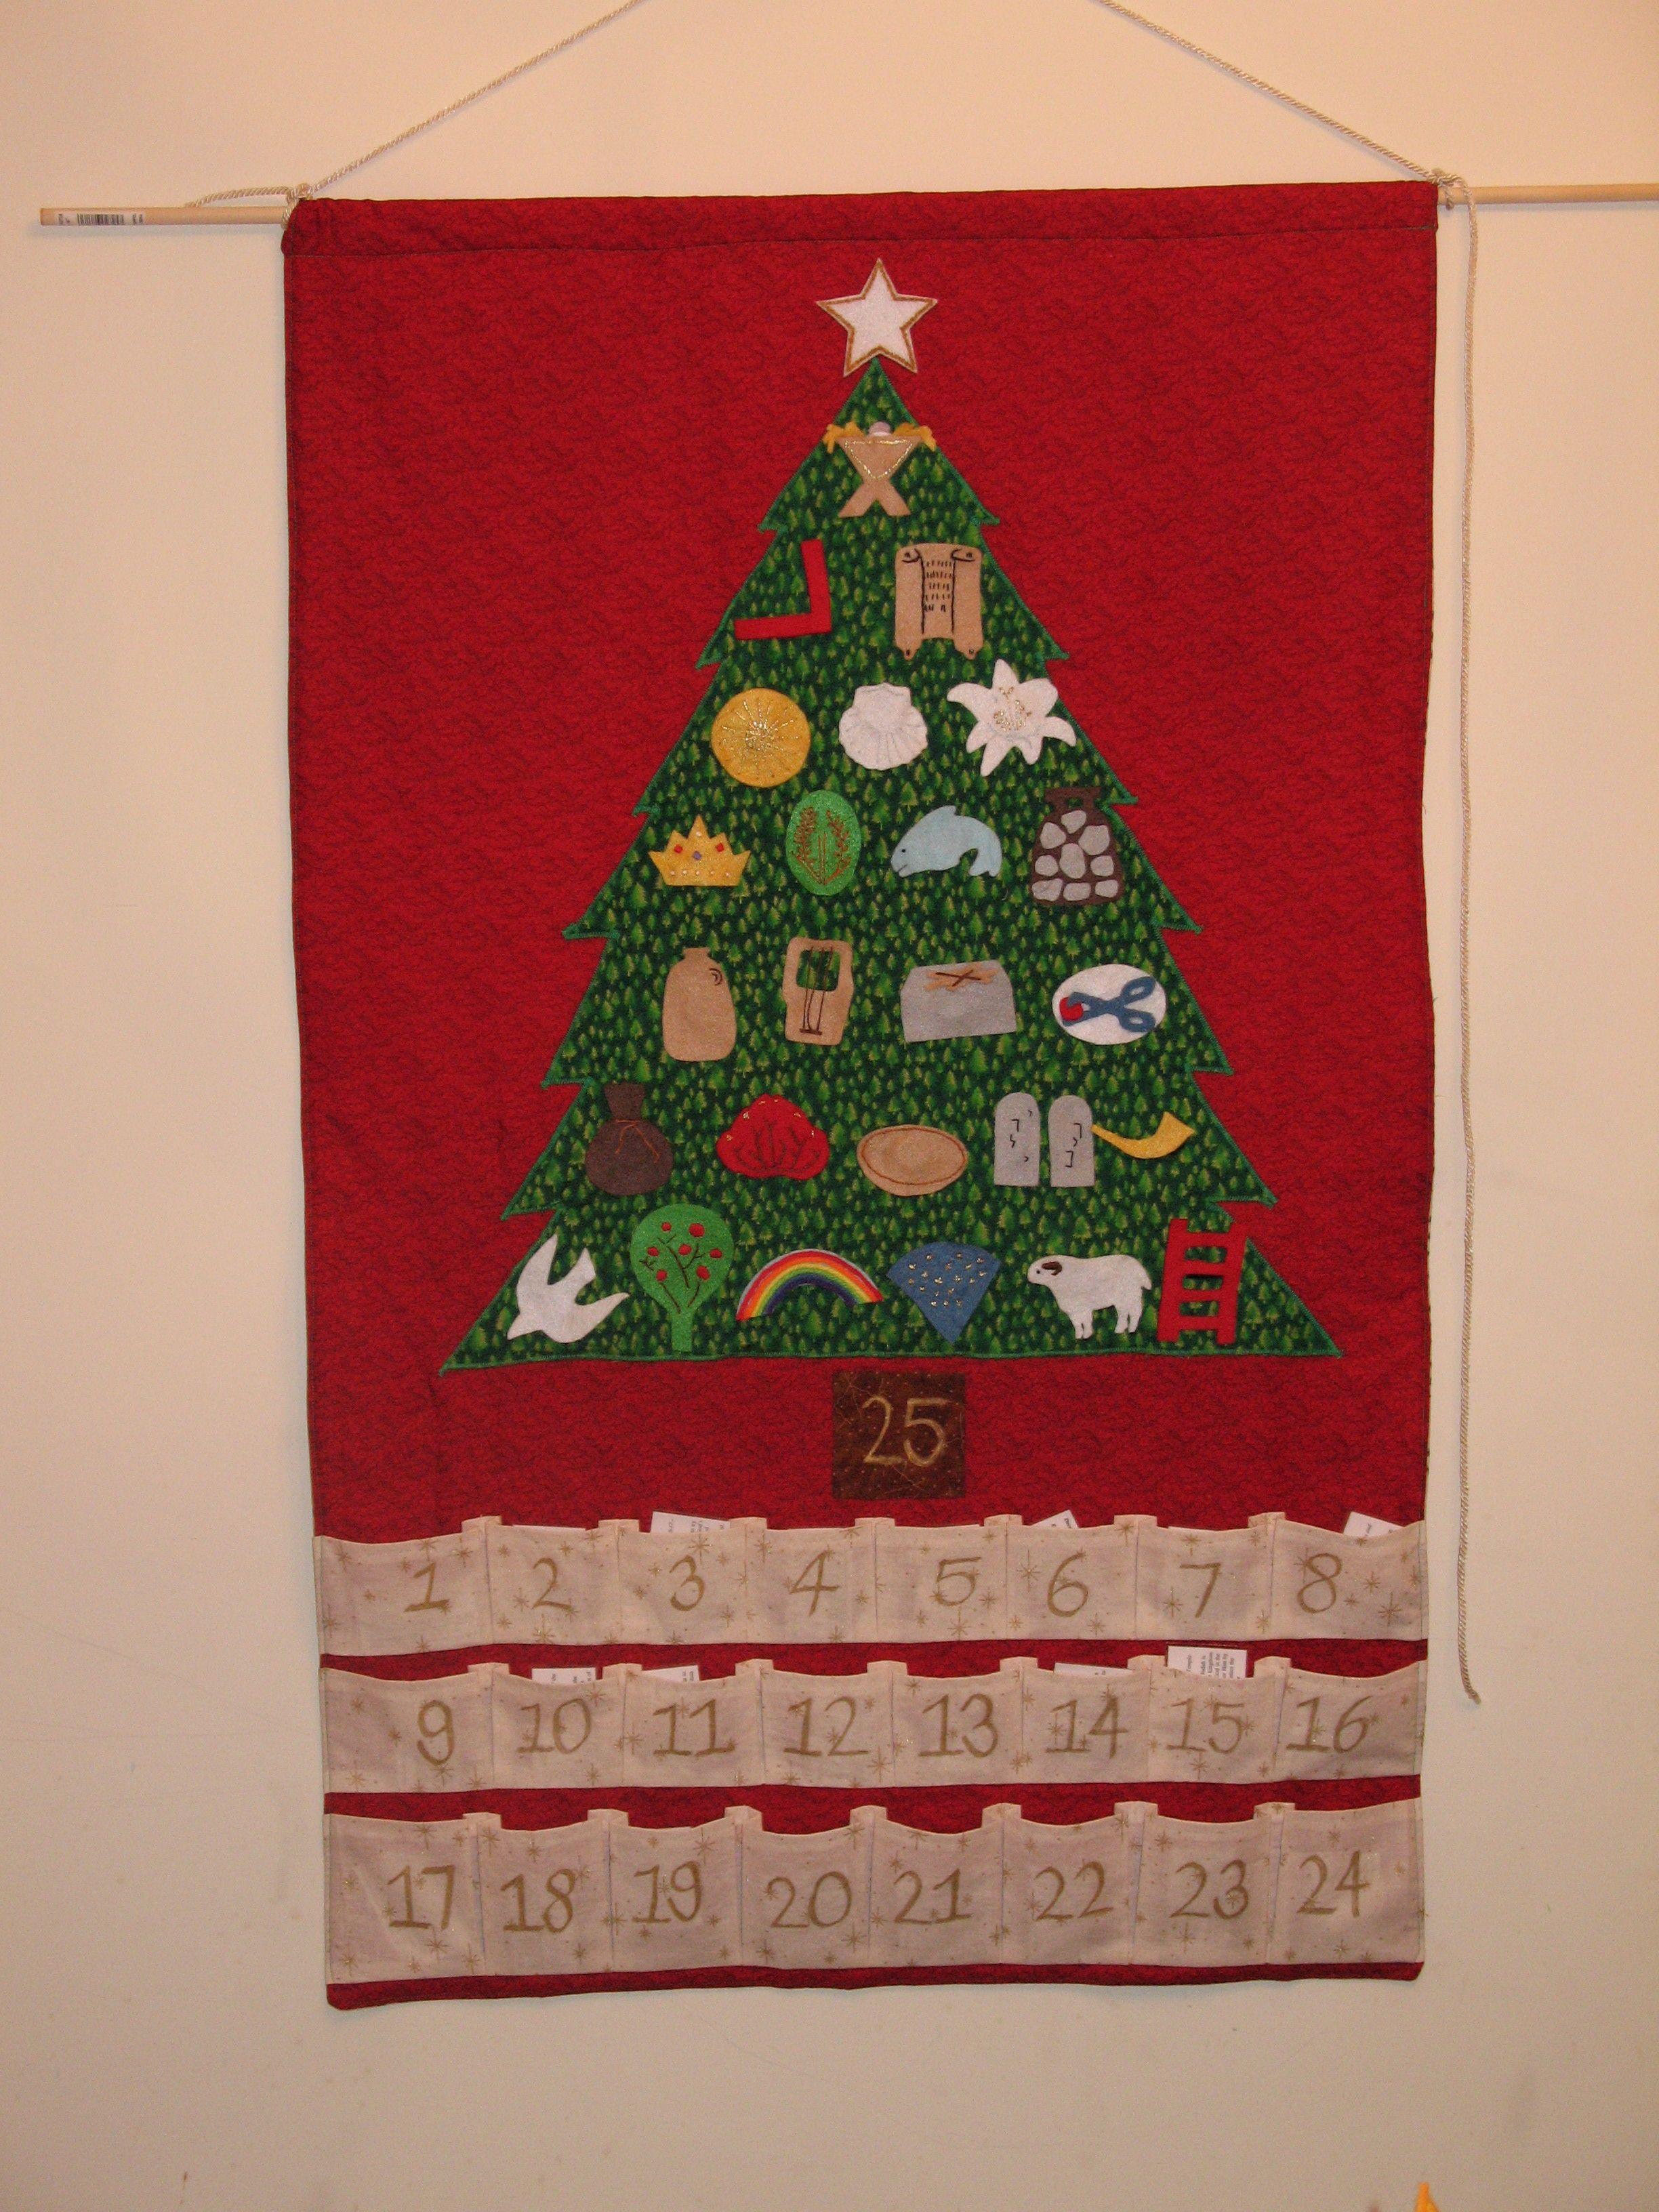 http://stayathomemyheart.files.wordpress.com/2009/12/jesse-tree-love-family-3.jpg